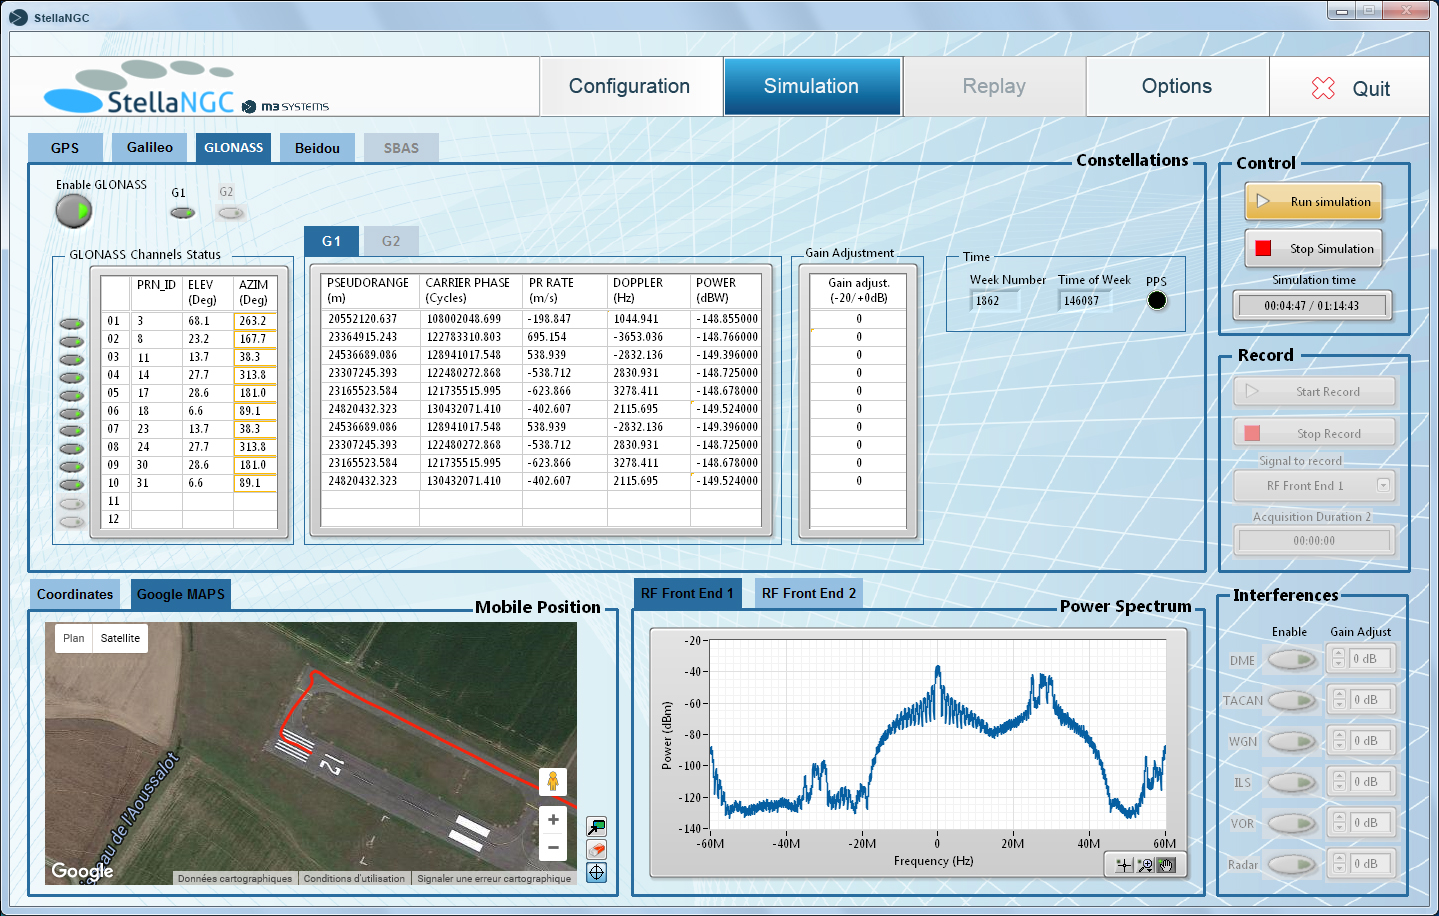 Simulation screen (google map view)